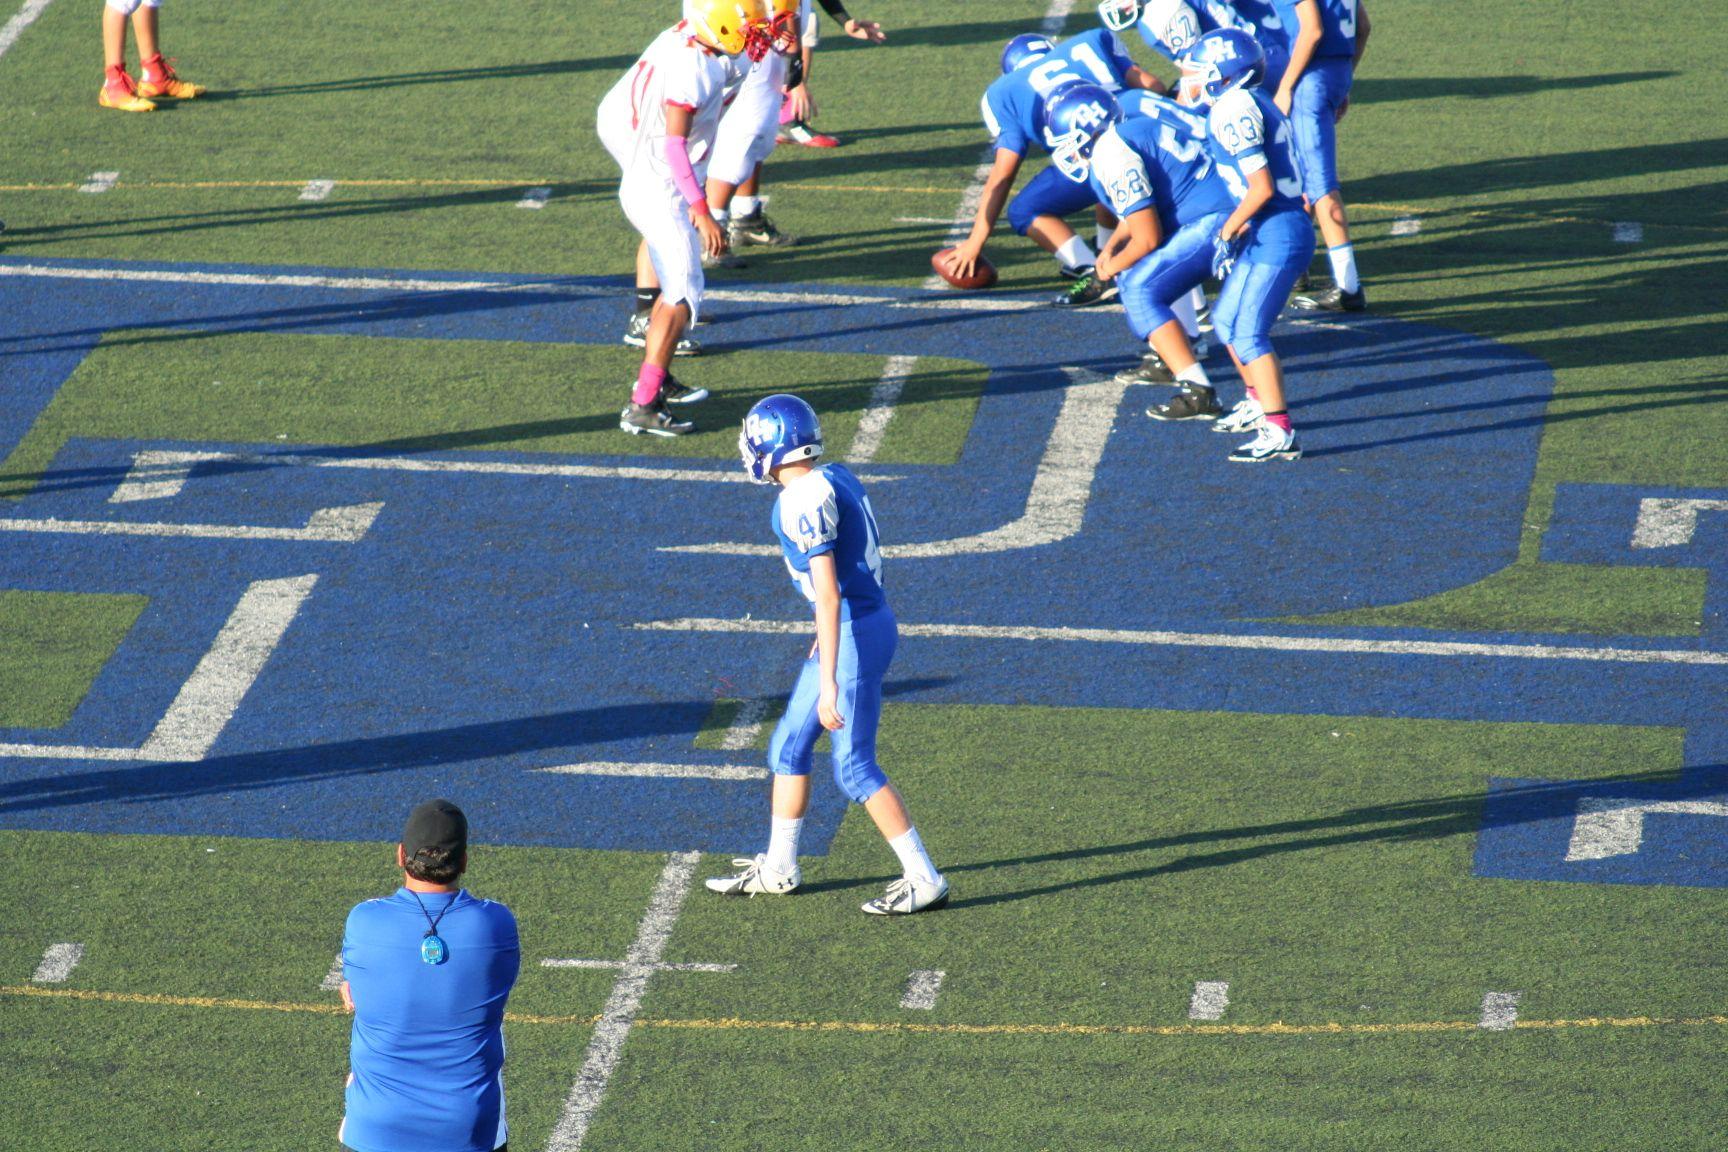 Pin by Dana Hills Football on 2014 DH Frosh vs Mission Viejo